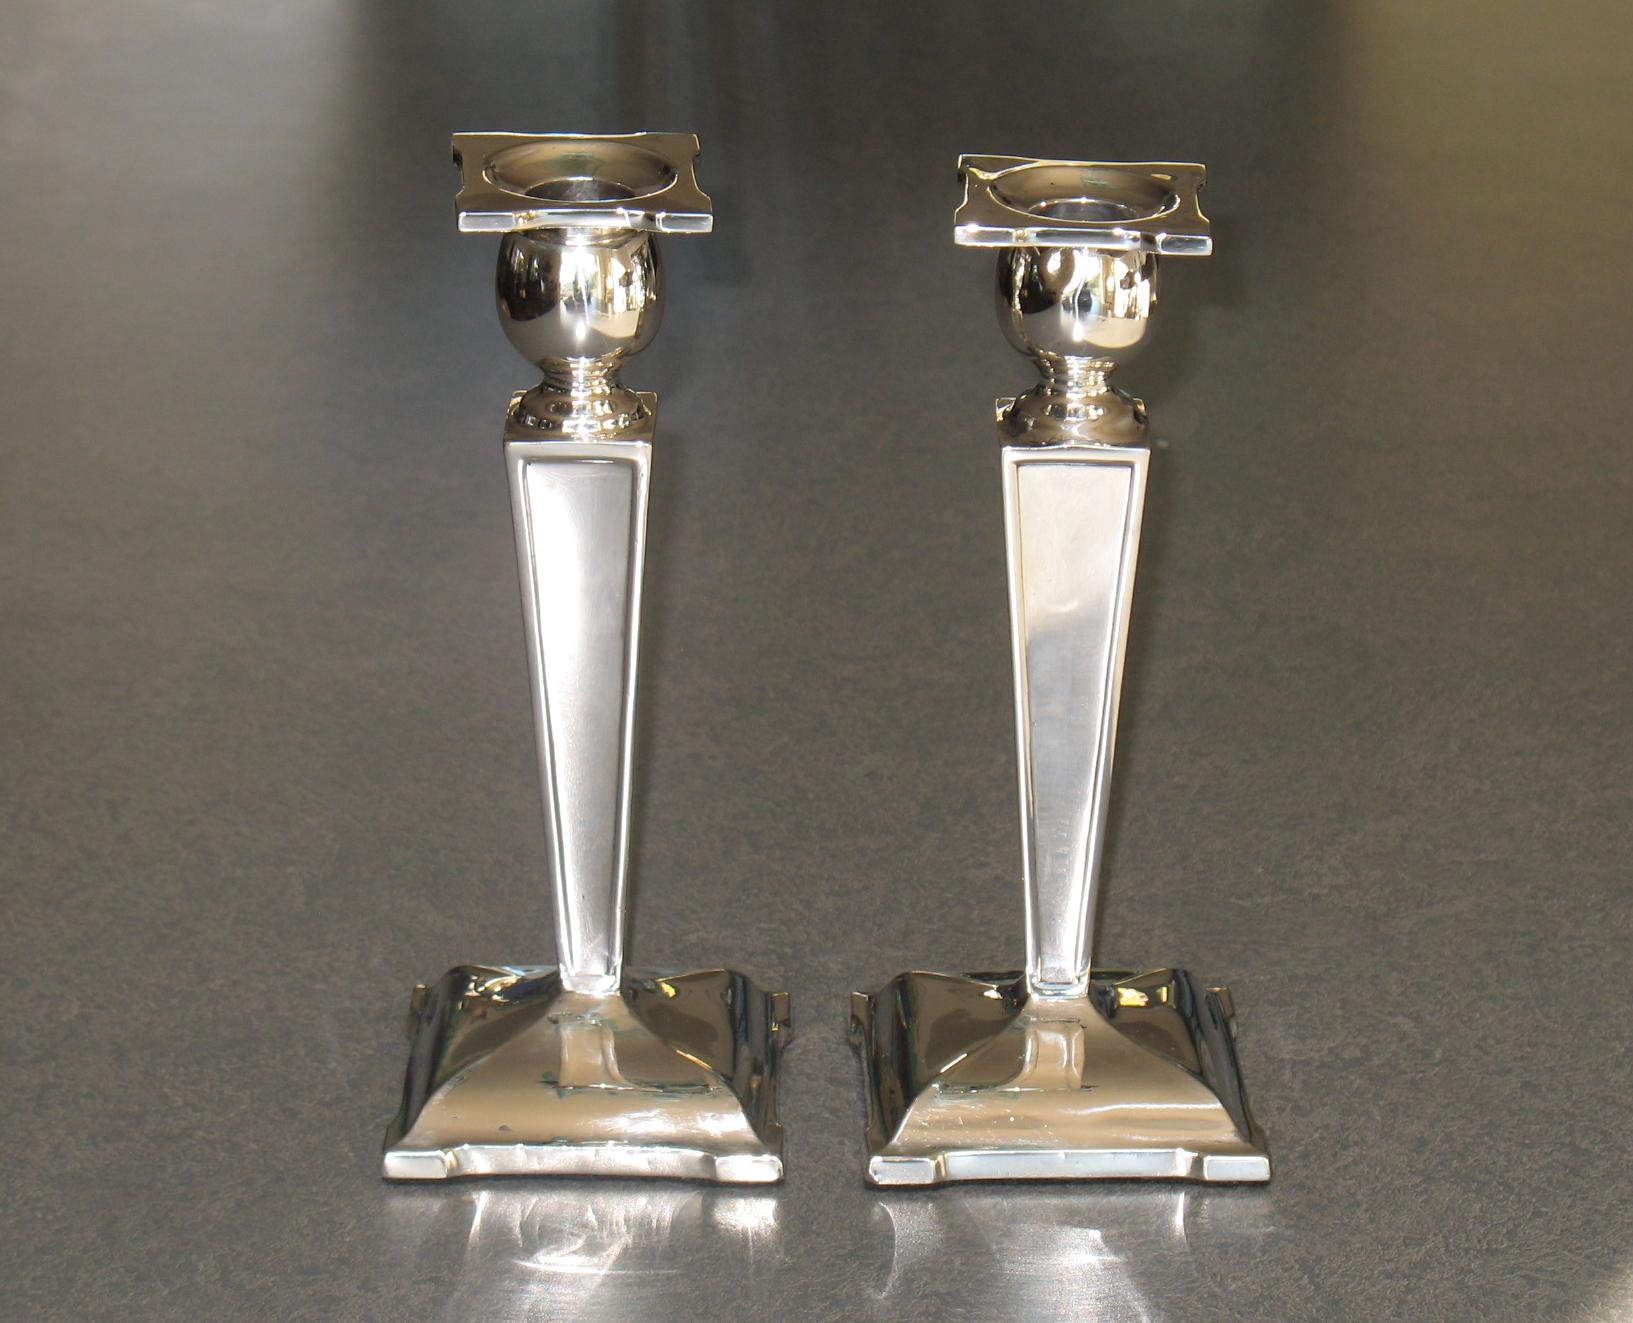 sterling-candlesticks-art-deco-repaired.JPG